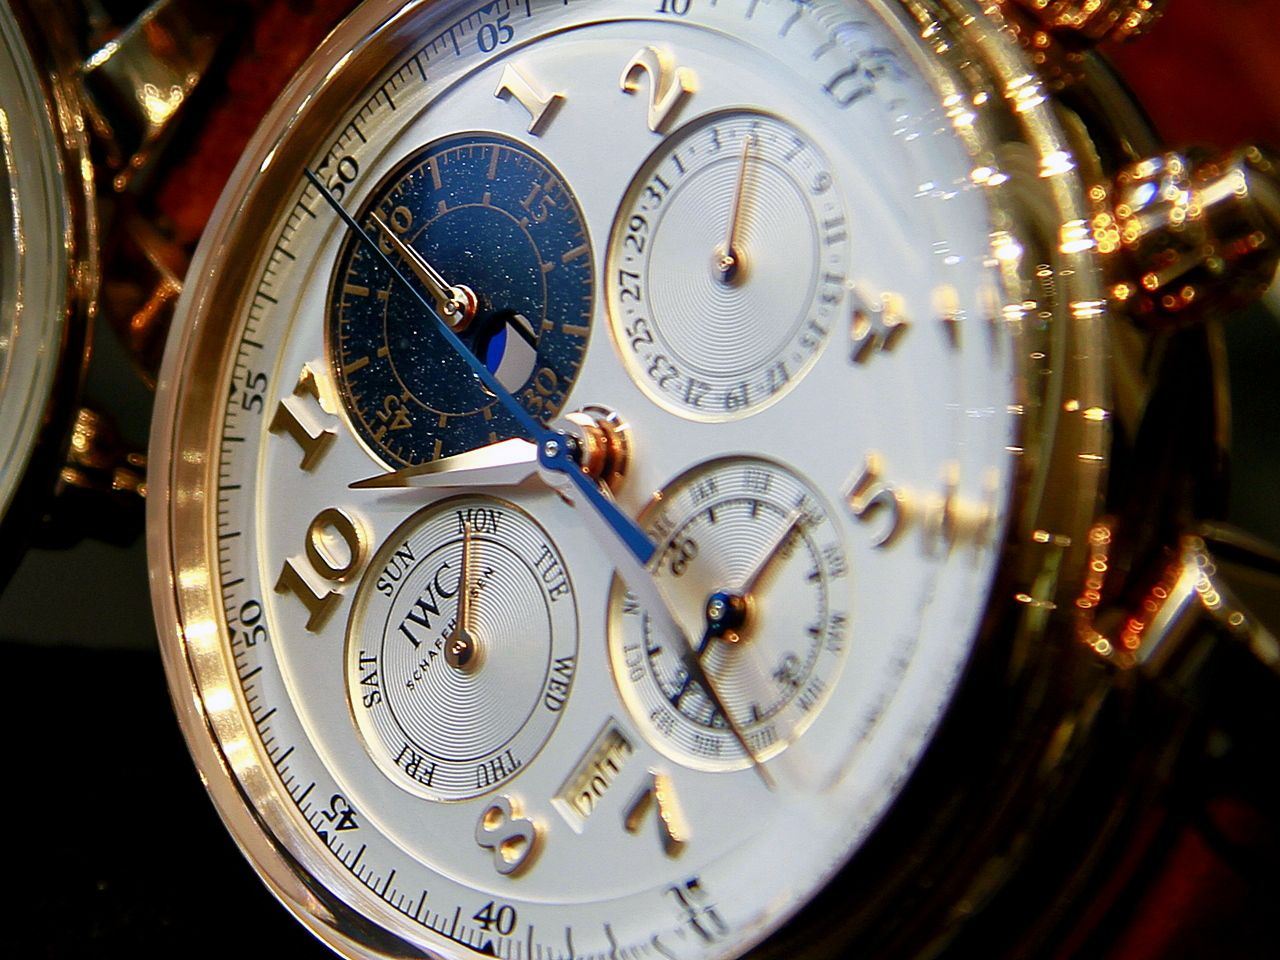 IWC_Da-Vinci_calendario-perpetuo_perpetual-calendar-0-100_6